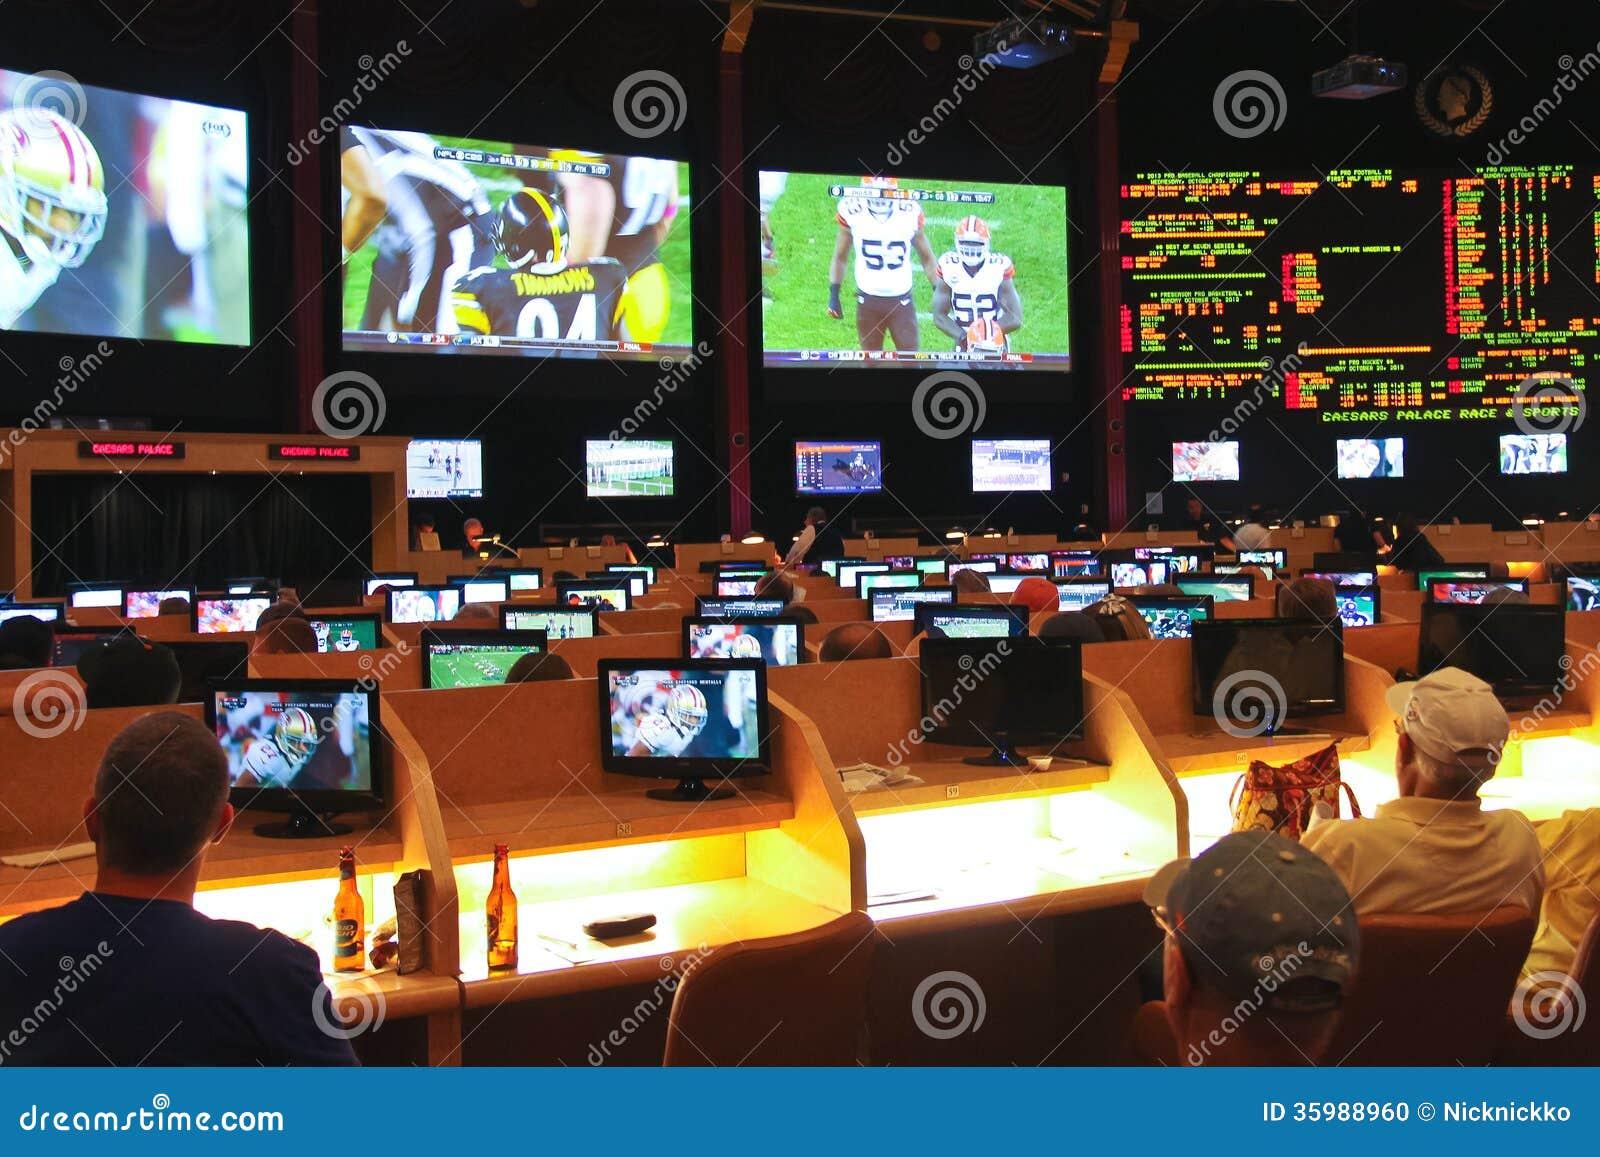 caesars palace online casino faust spielen